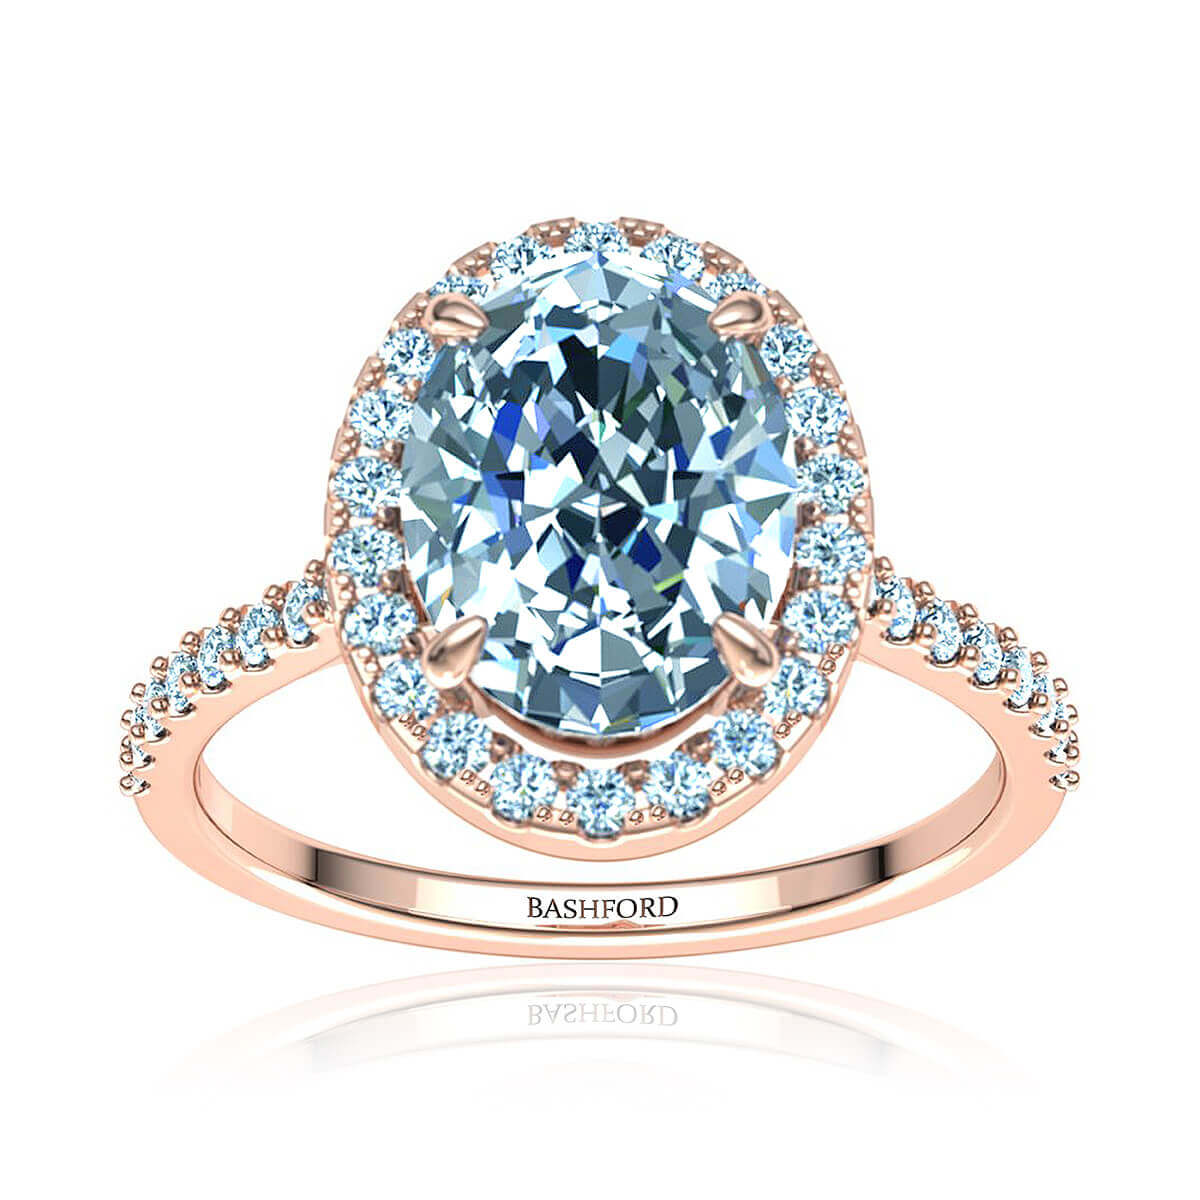 Solana Diamond Ring (with VS2, F, 7/8 Carat Oval Diamond)